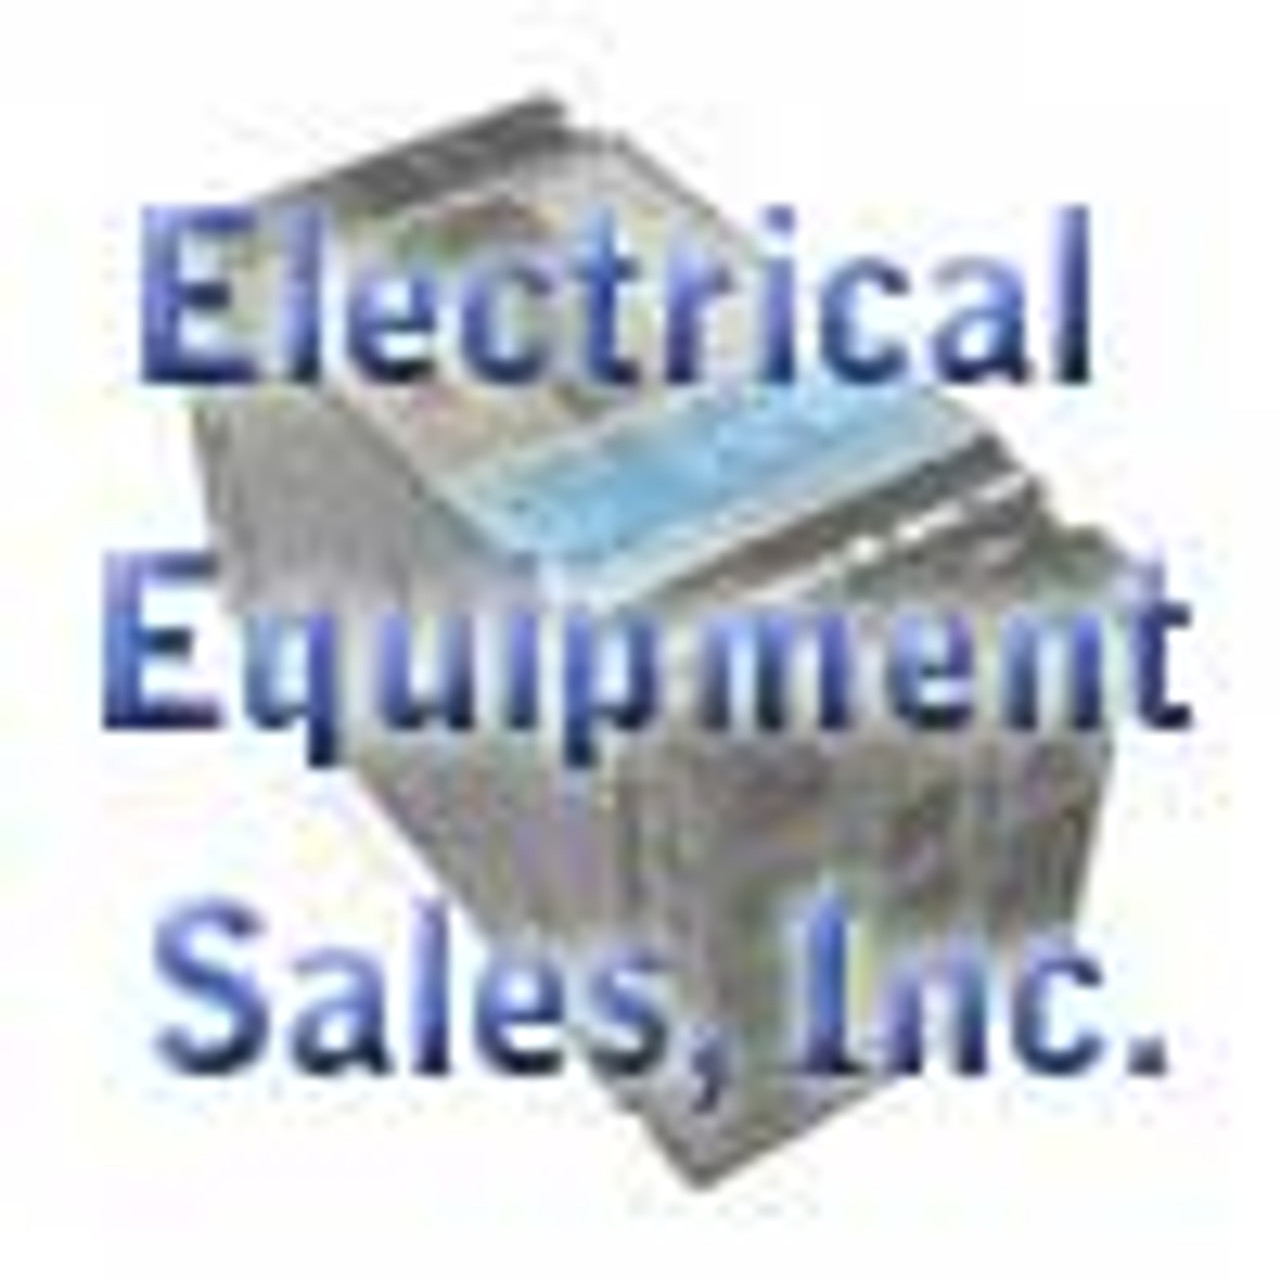 Sylvania QFP2200 2 Pole 200 Amp 240VAC Circuit Breaker - Used